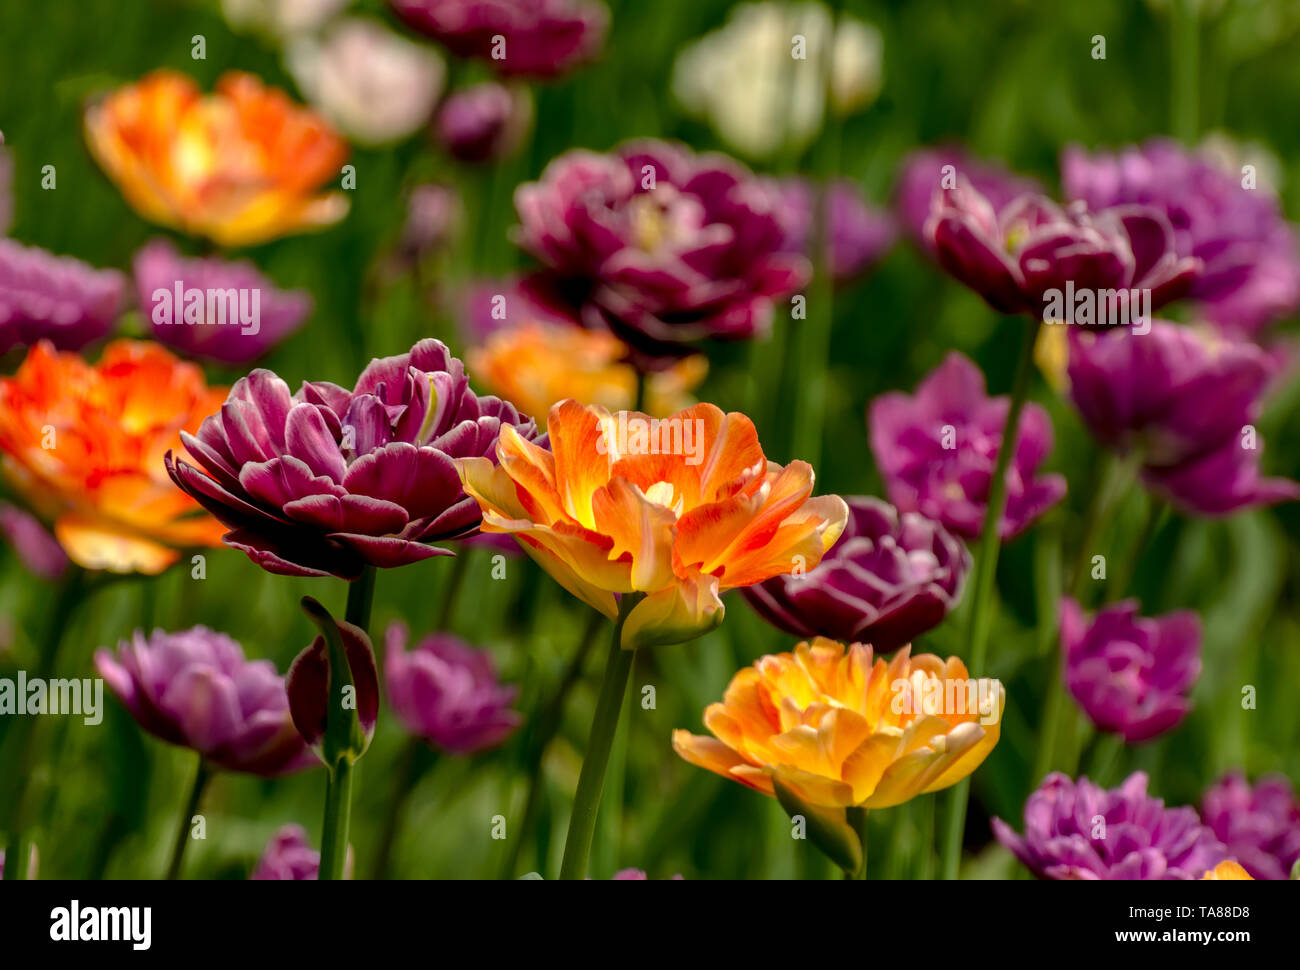 Tulip festival in St. Petersburg on Elagin island in may 2019. - Stock Image